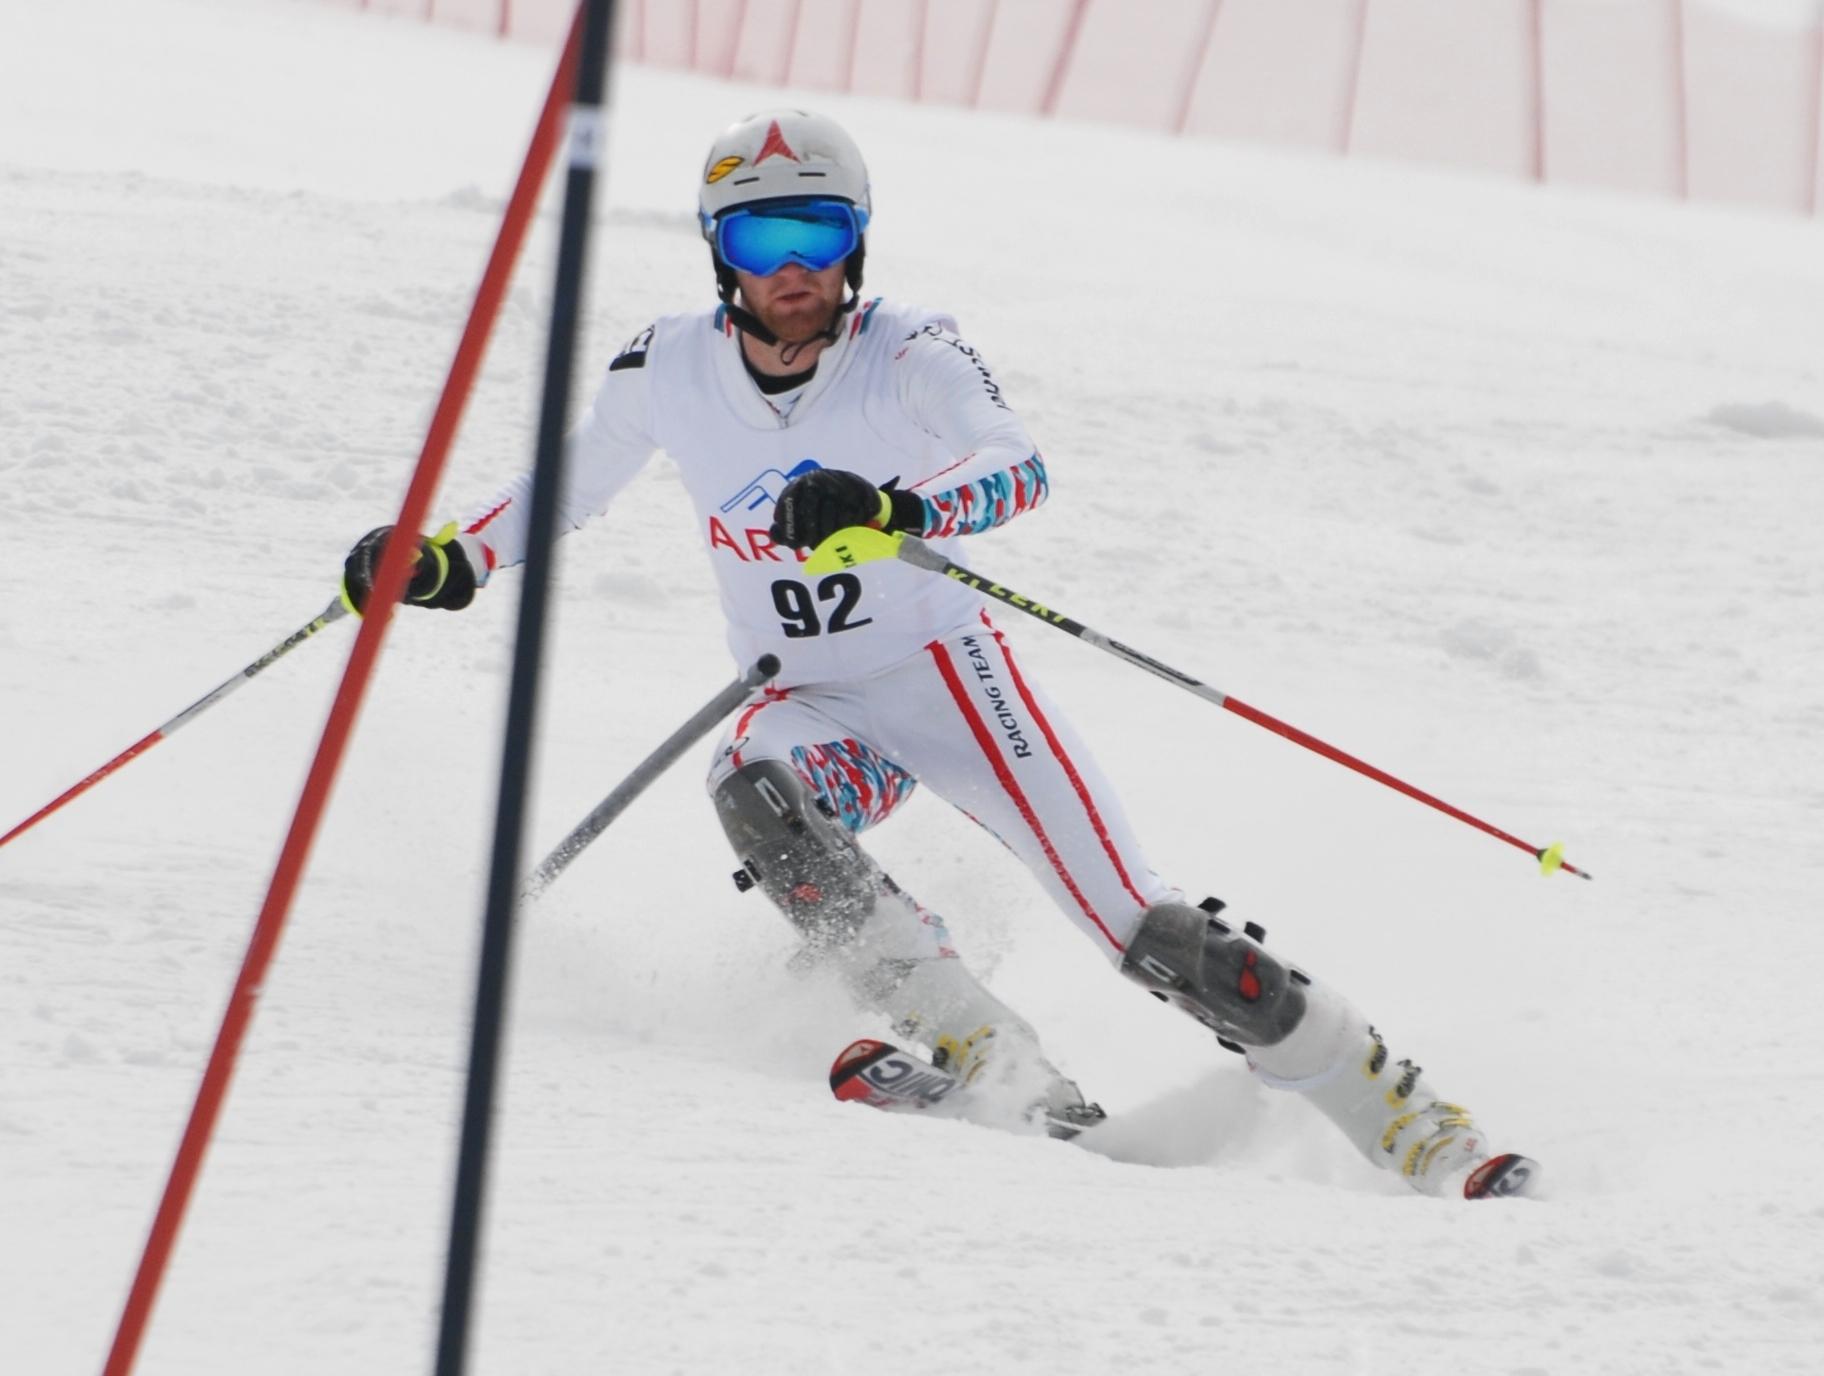 DJK Bundeswinterspiele Skifahrer